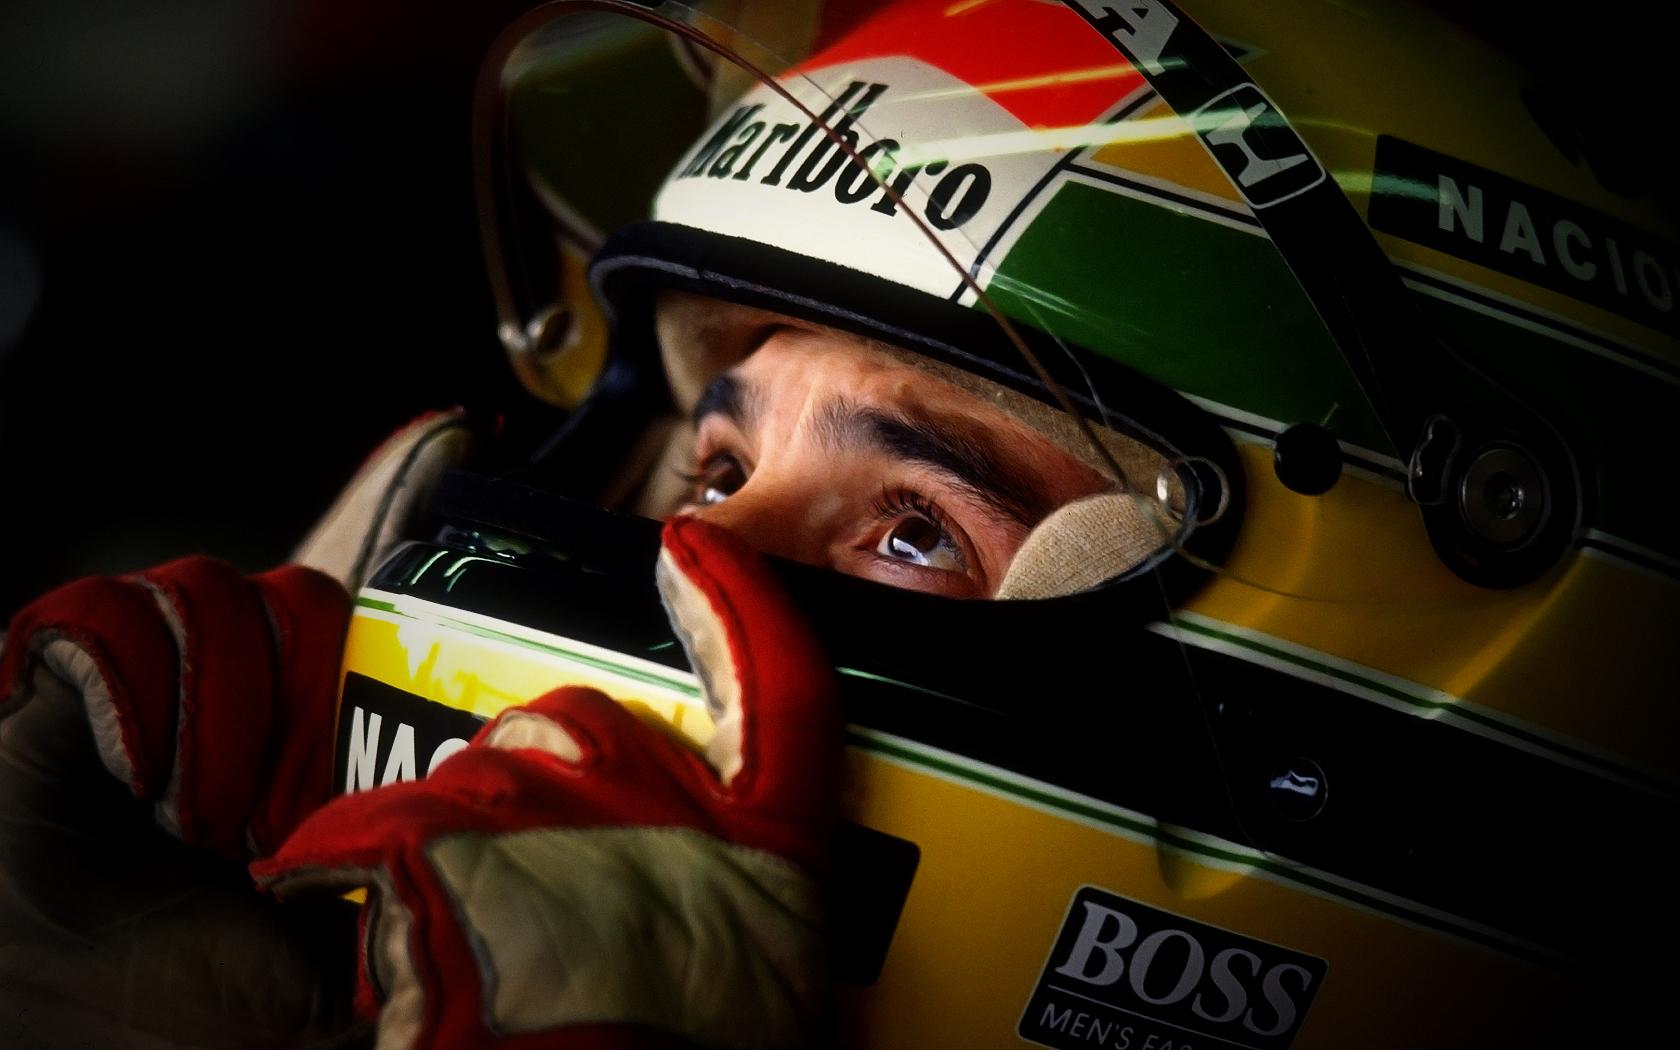 77 Senna Wallpaper On Wallpapersafari